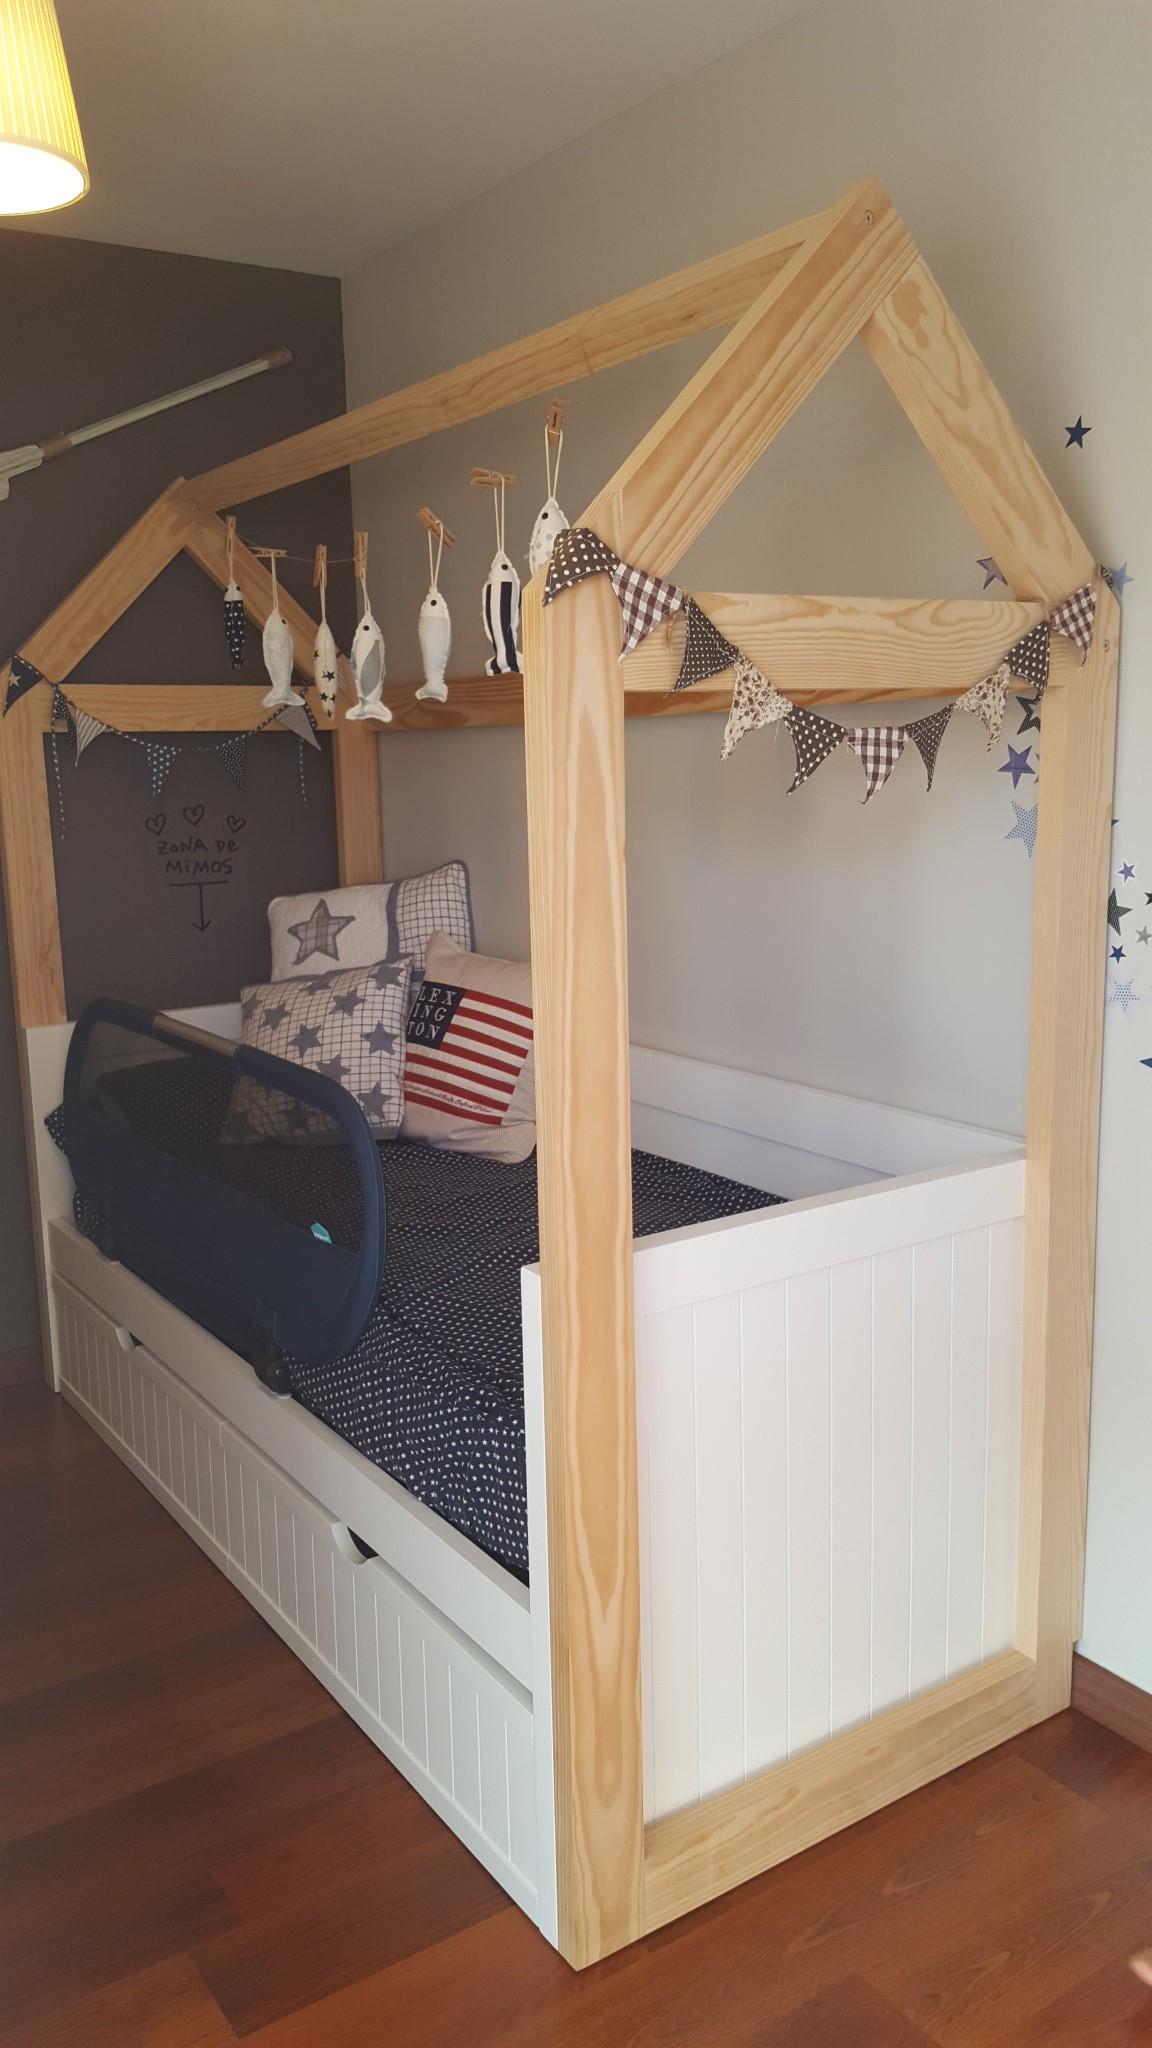 Casita para cama mueble infantil for Cama de casita